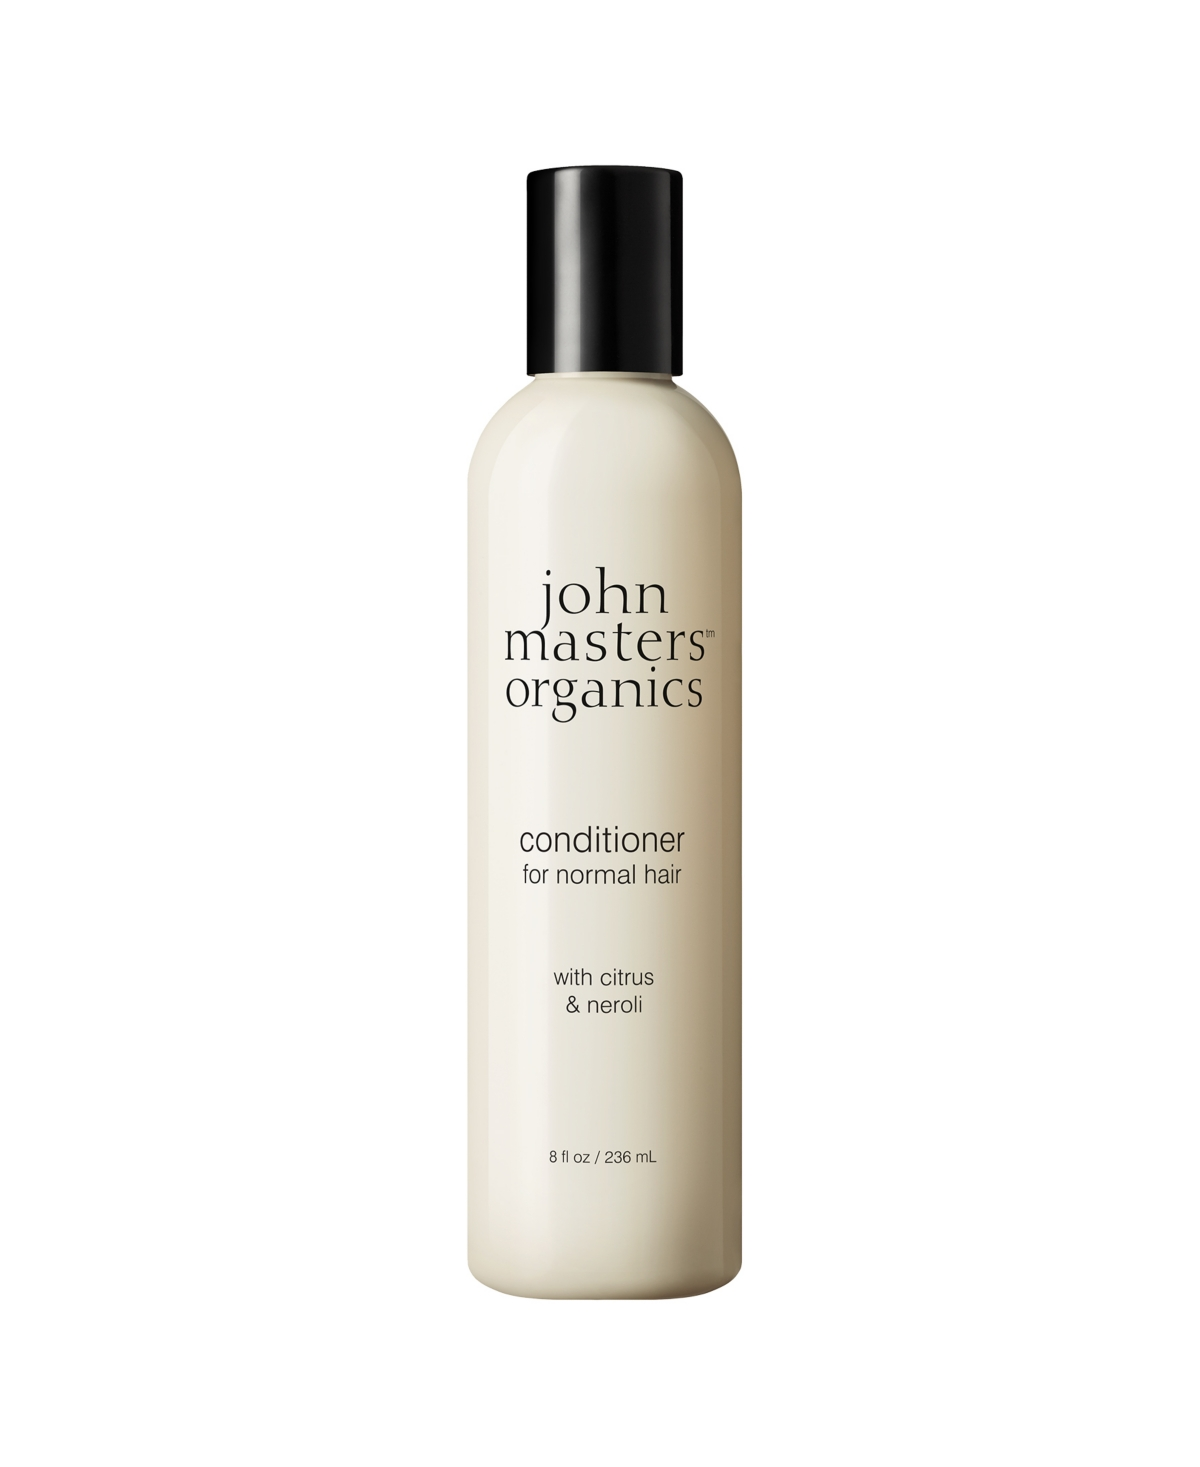 John Masters Organics Conditioner for Normal Hair with Citrus Neroli- 8 fl. oz.